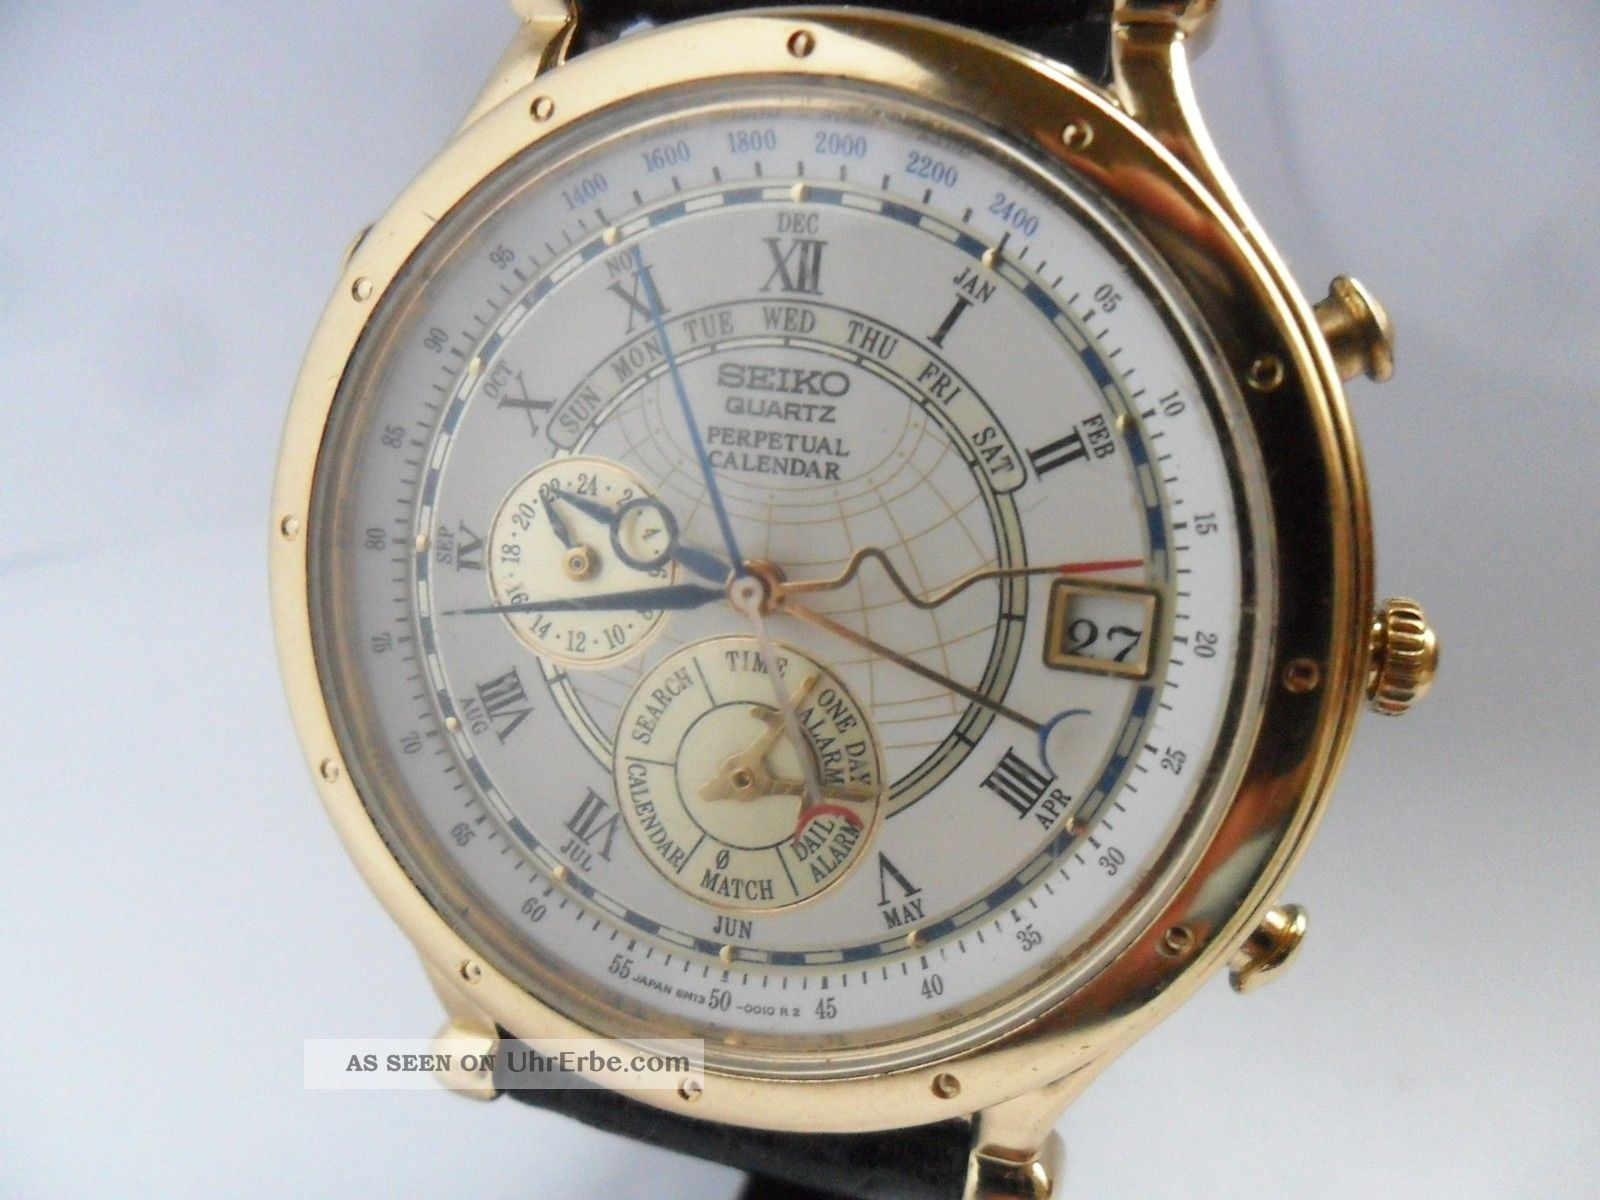 Seiko Perpetual Calendar Vintage : Herrenuhr seiko perpetual calendar gold plated japan watch top